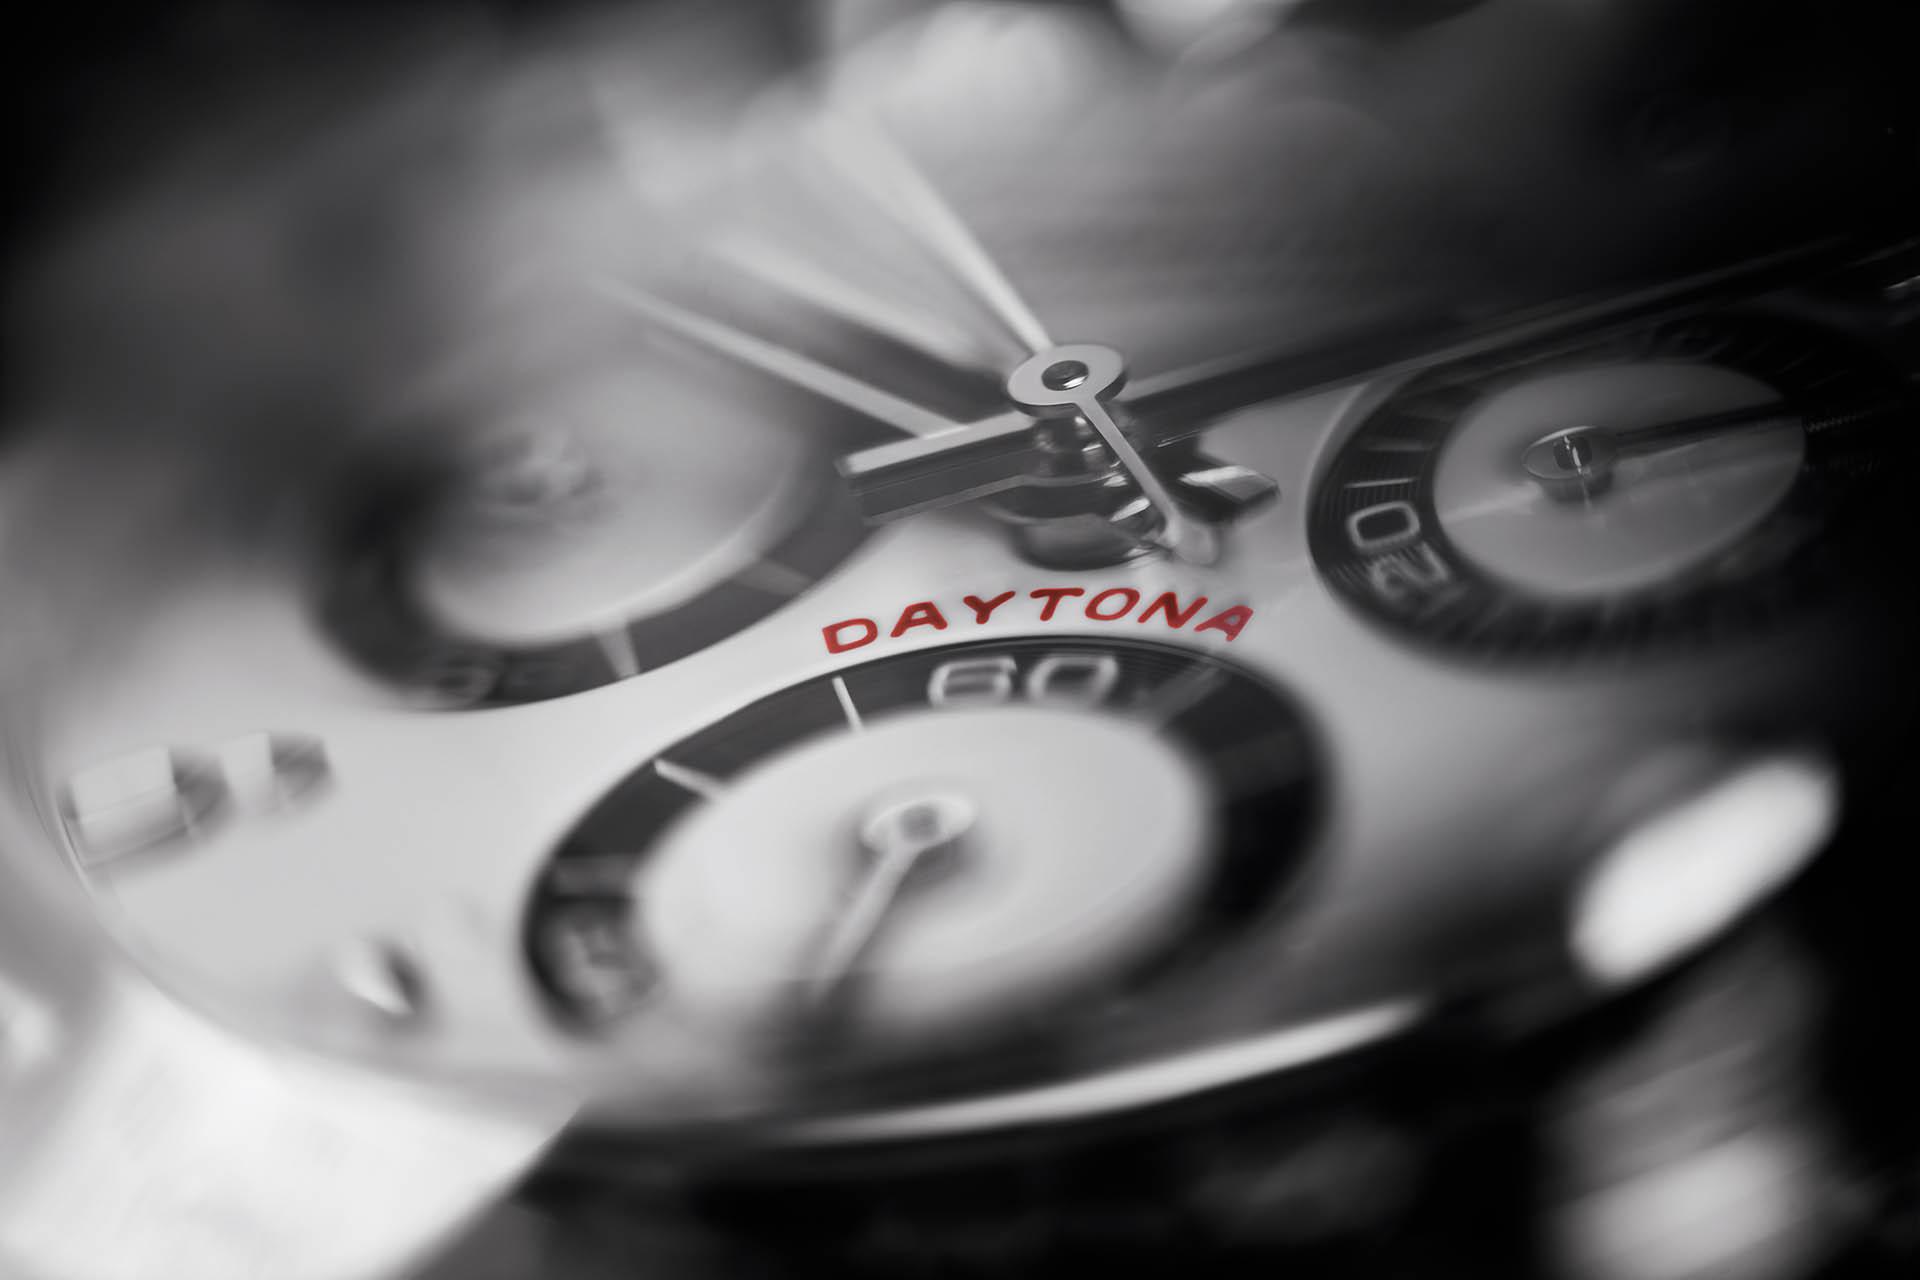 Ziferblattdetail Daytona